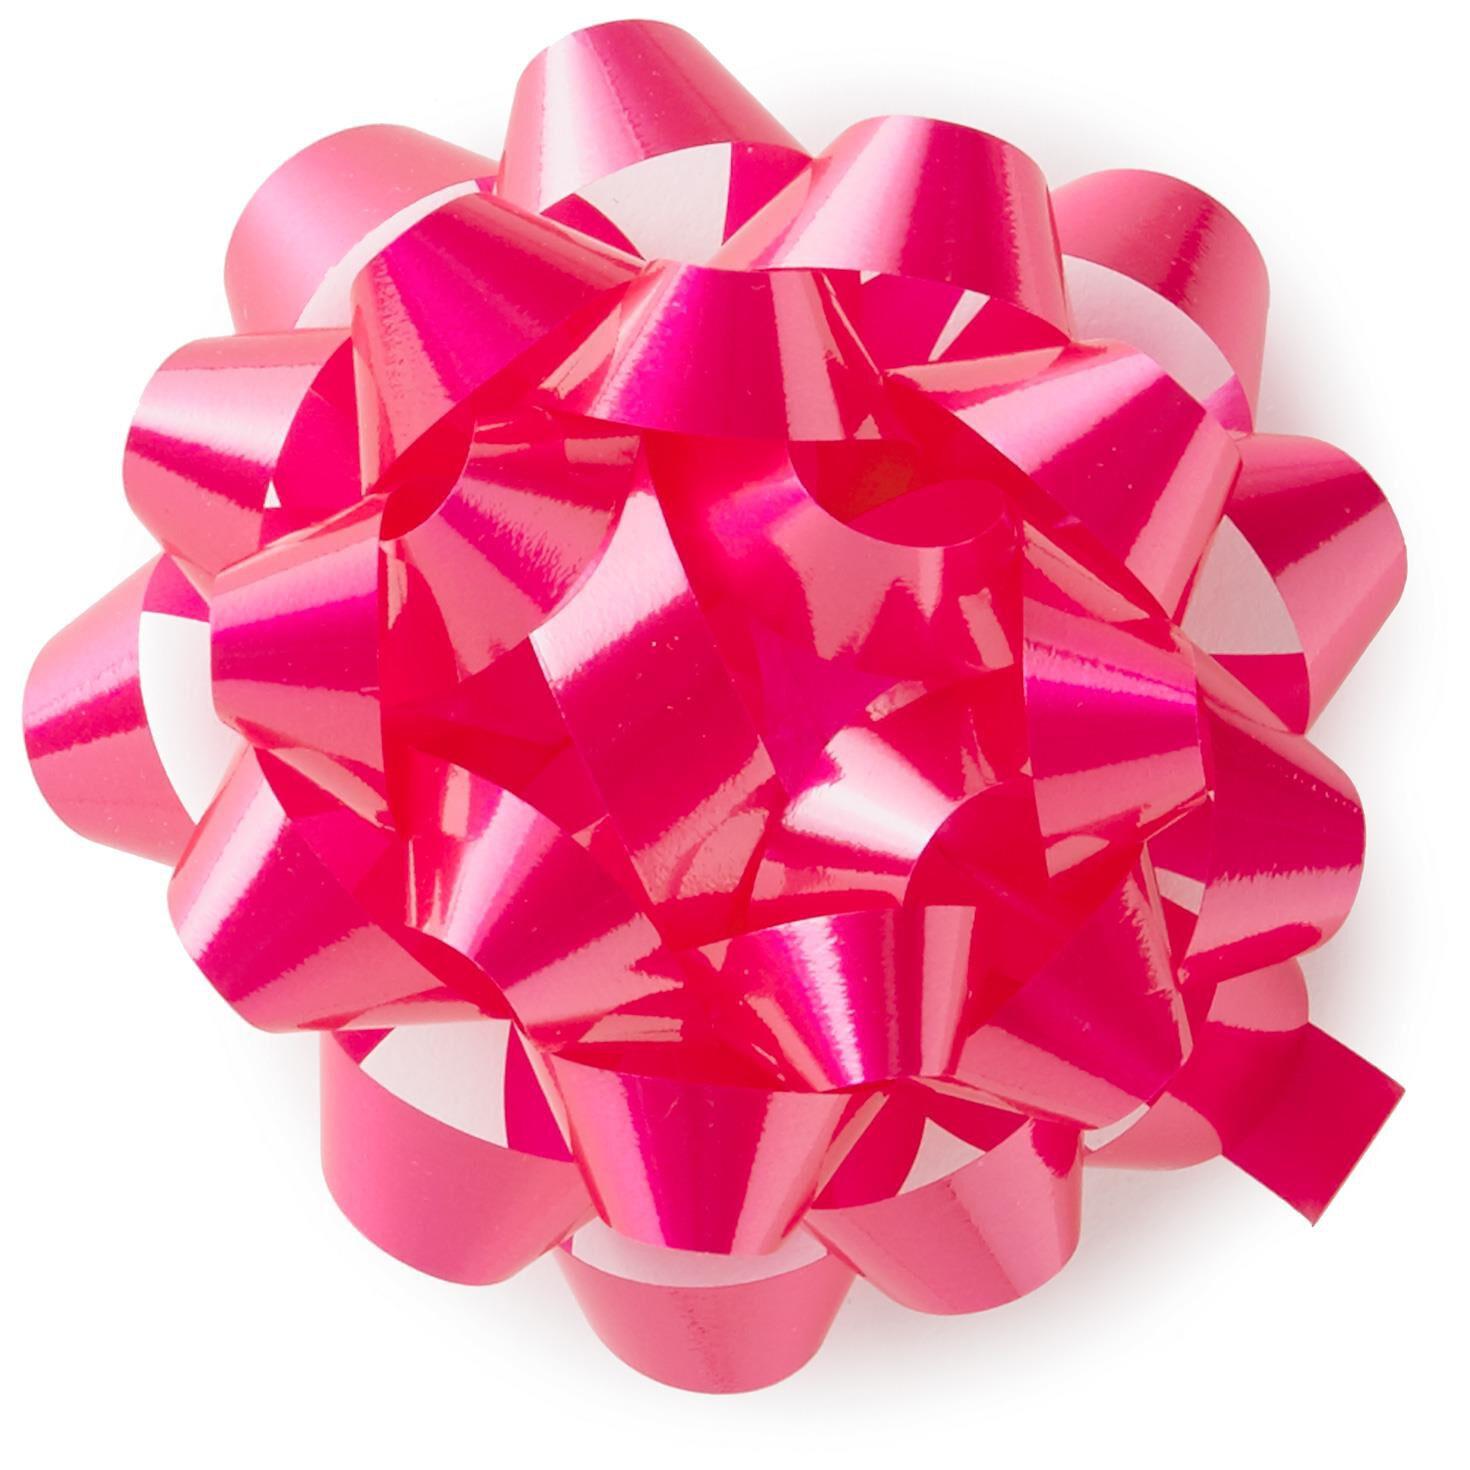 Bright pink high gloss ribbon confetti gift bow 4 58 bows bright pink high gloss ribbon confetti gift bow 4 58 bows ribbons hallmark negle Image collections